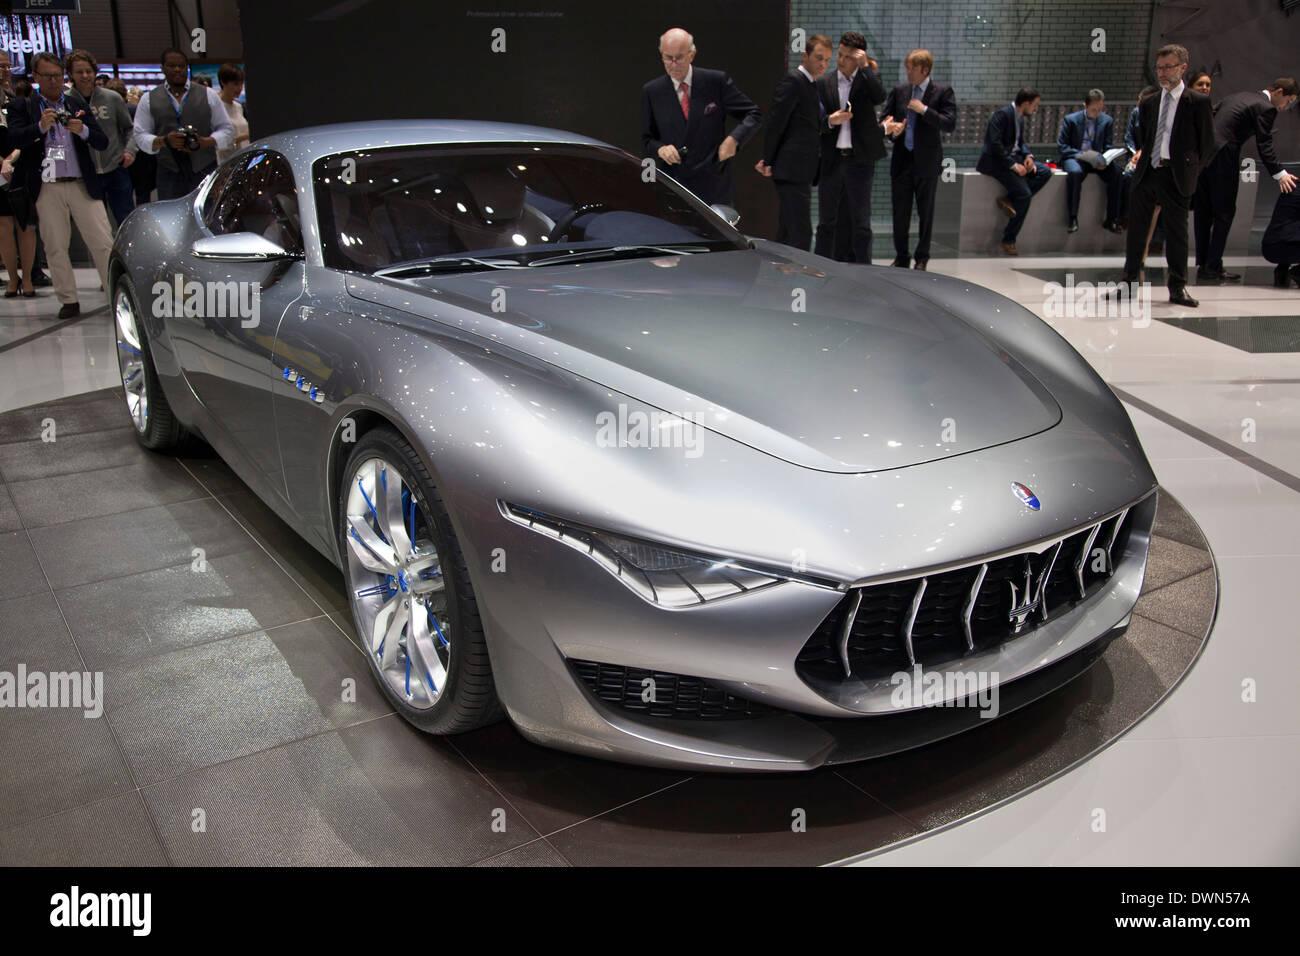 Maserati Alfieri concept at the 84th Geneva International Motor Show 2014. - Stock Image